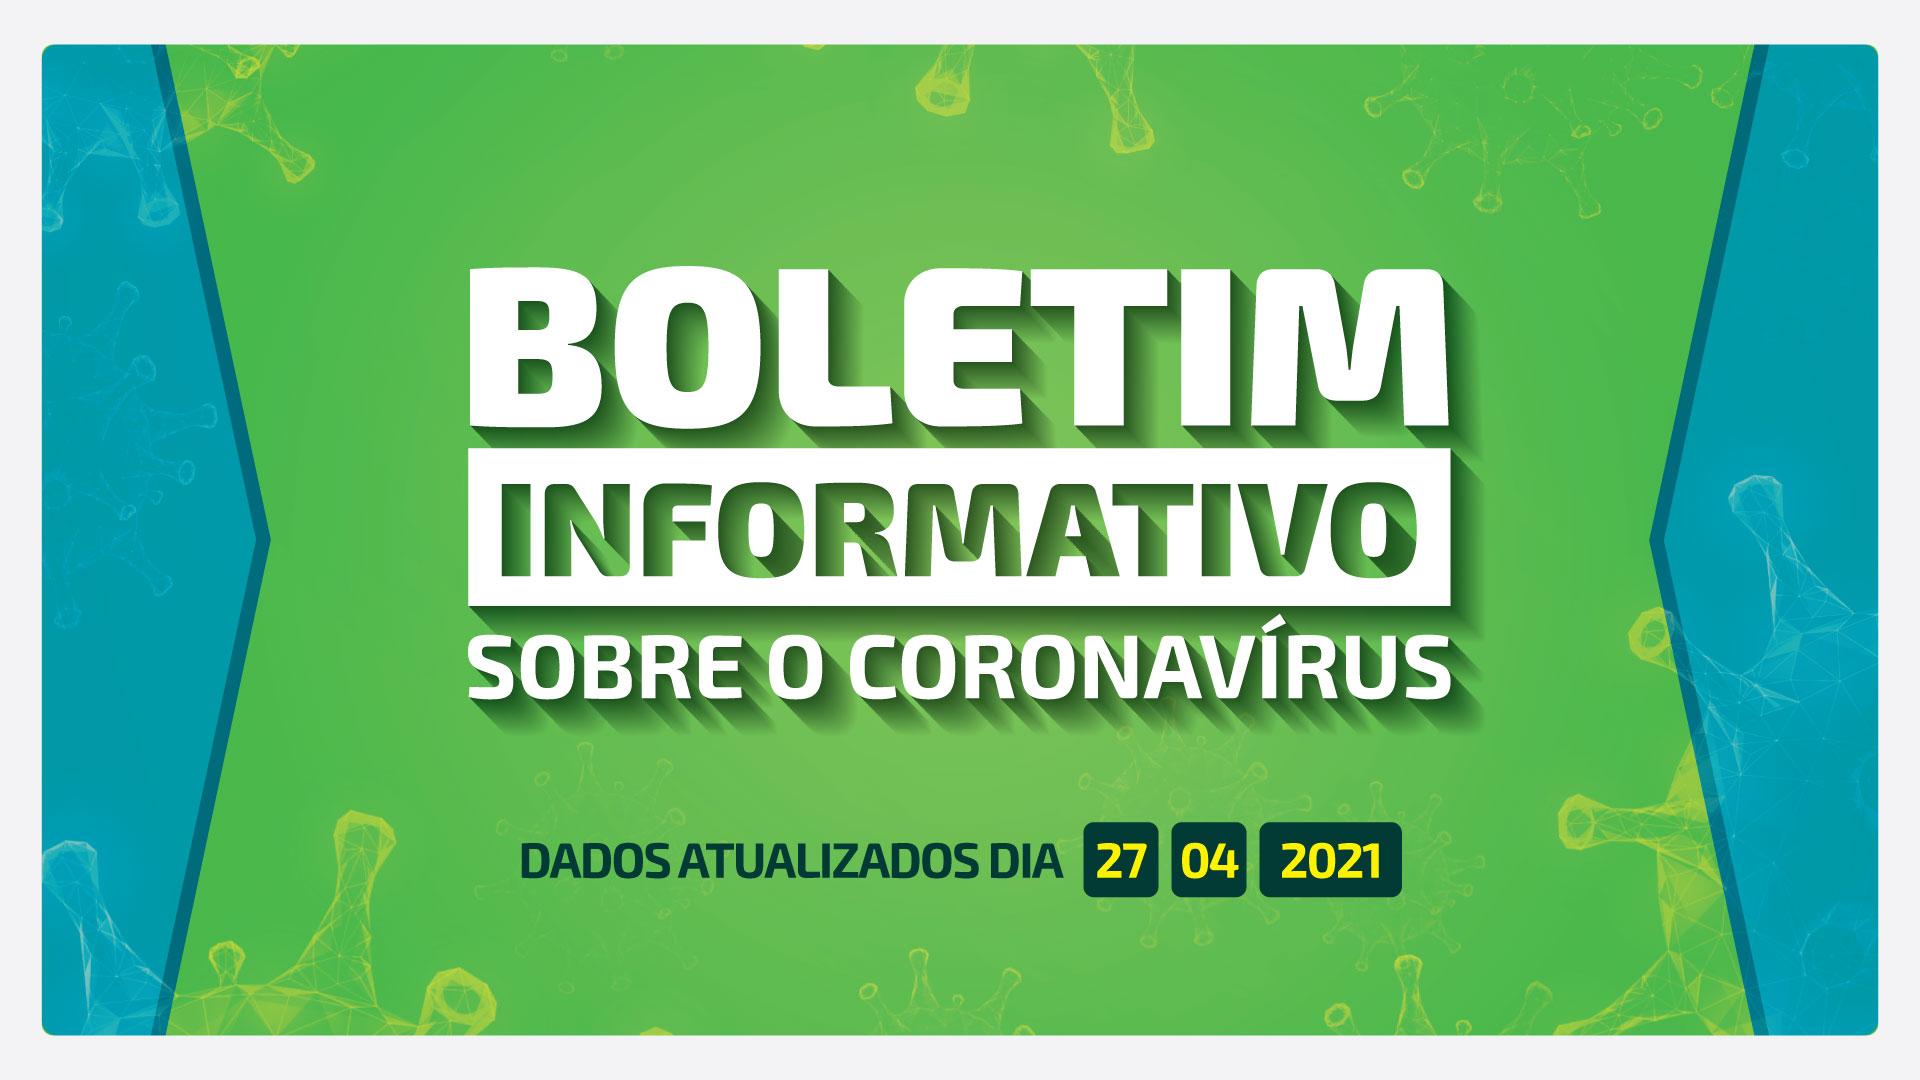 BOLETIM DIÁRIO CORONAVÍRUS - 27/04/2021